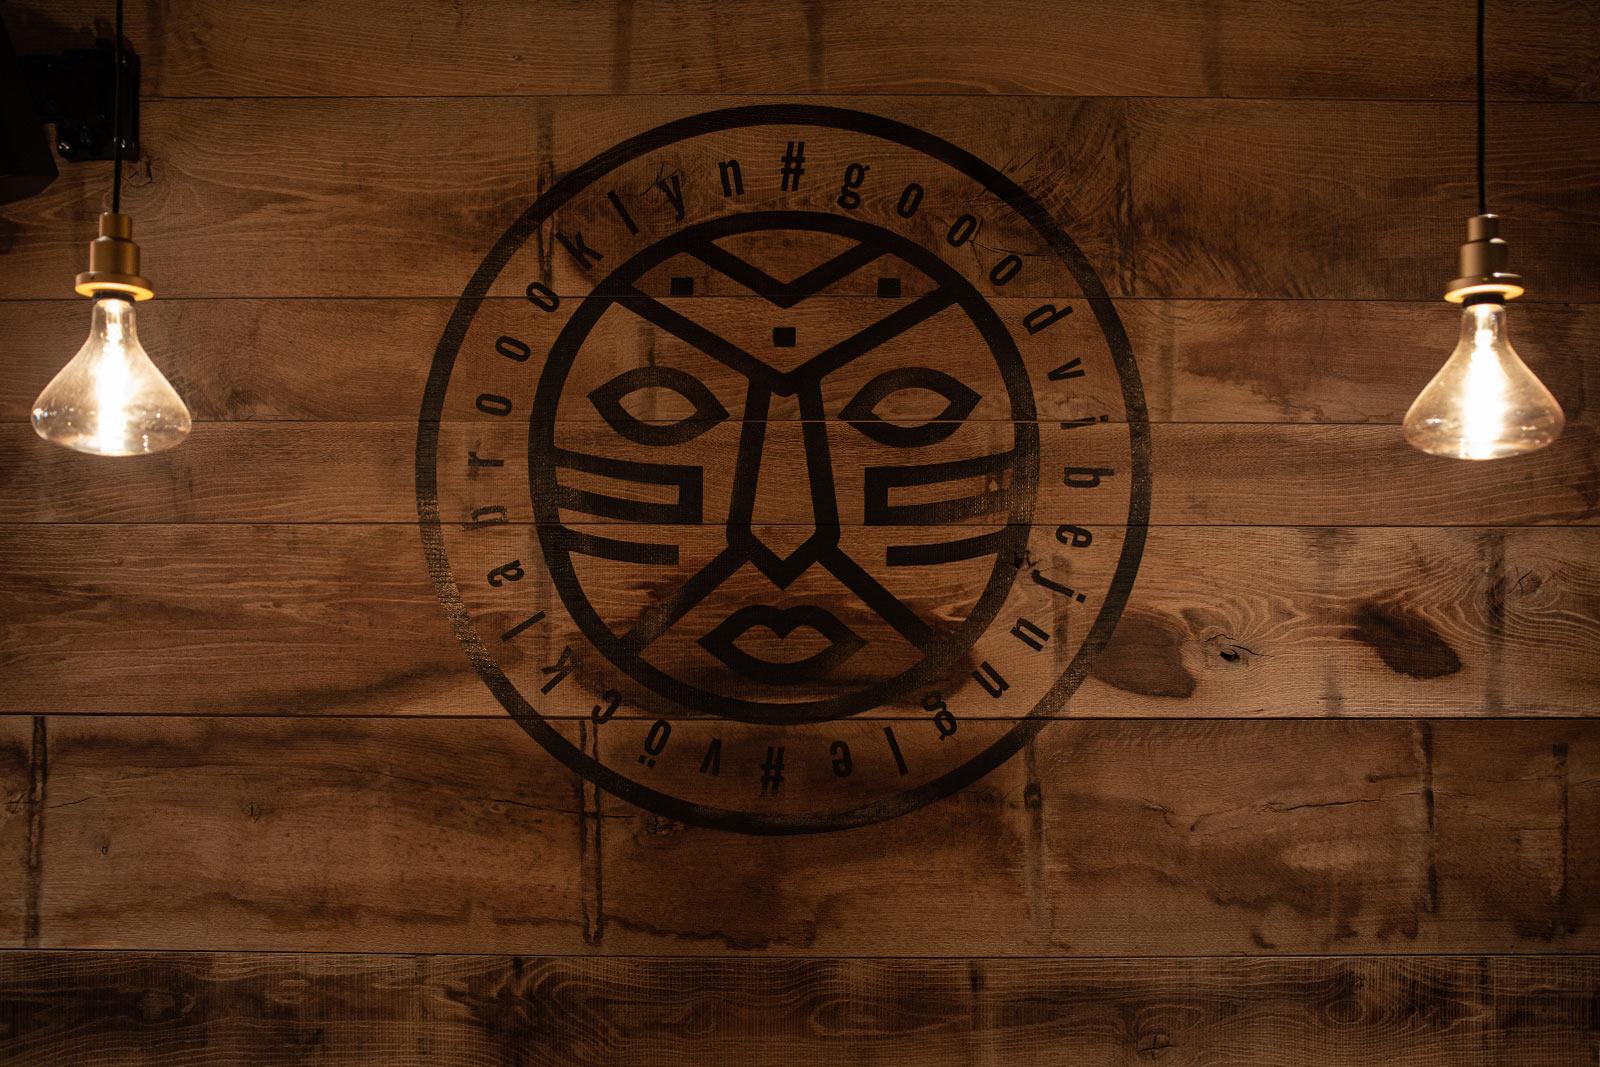 walldesign-wanddesign-branding_broooklyn-anti-form-michael-schumer